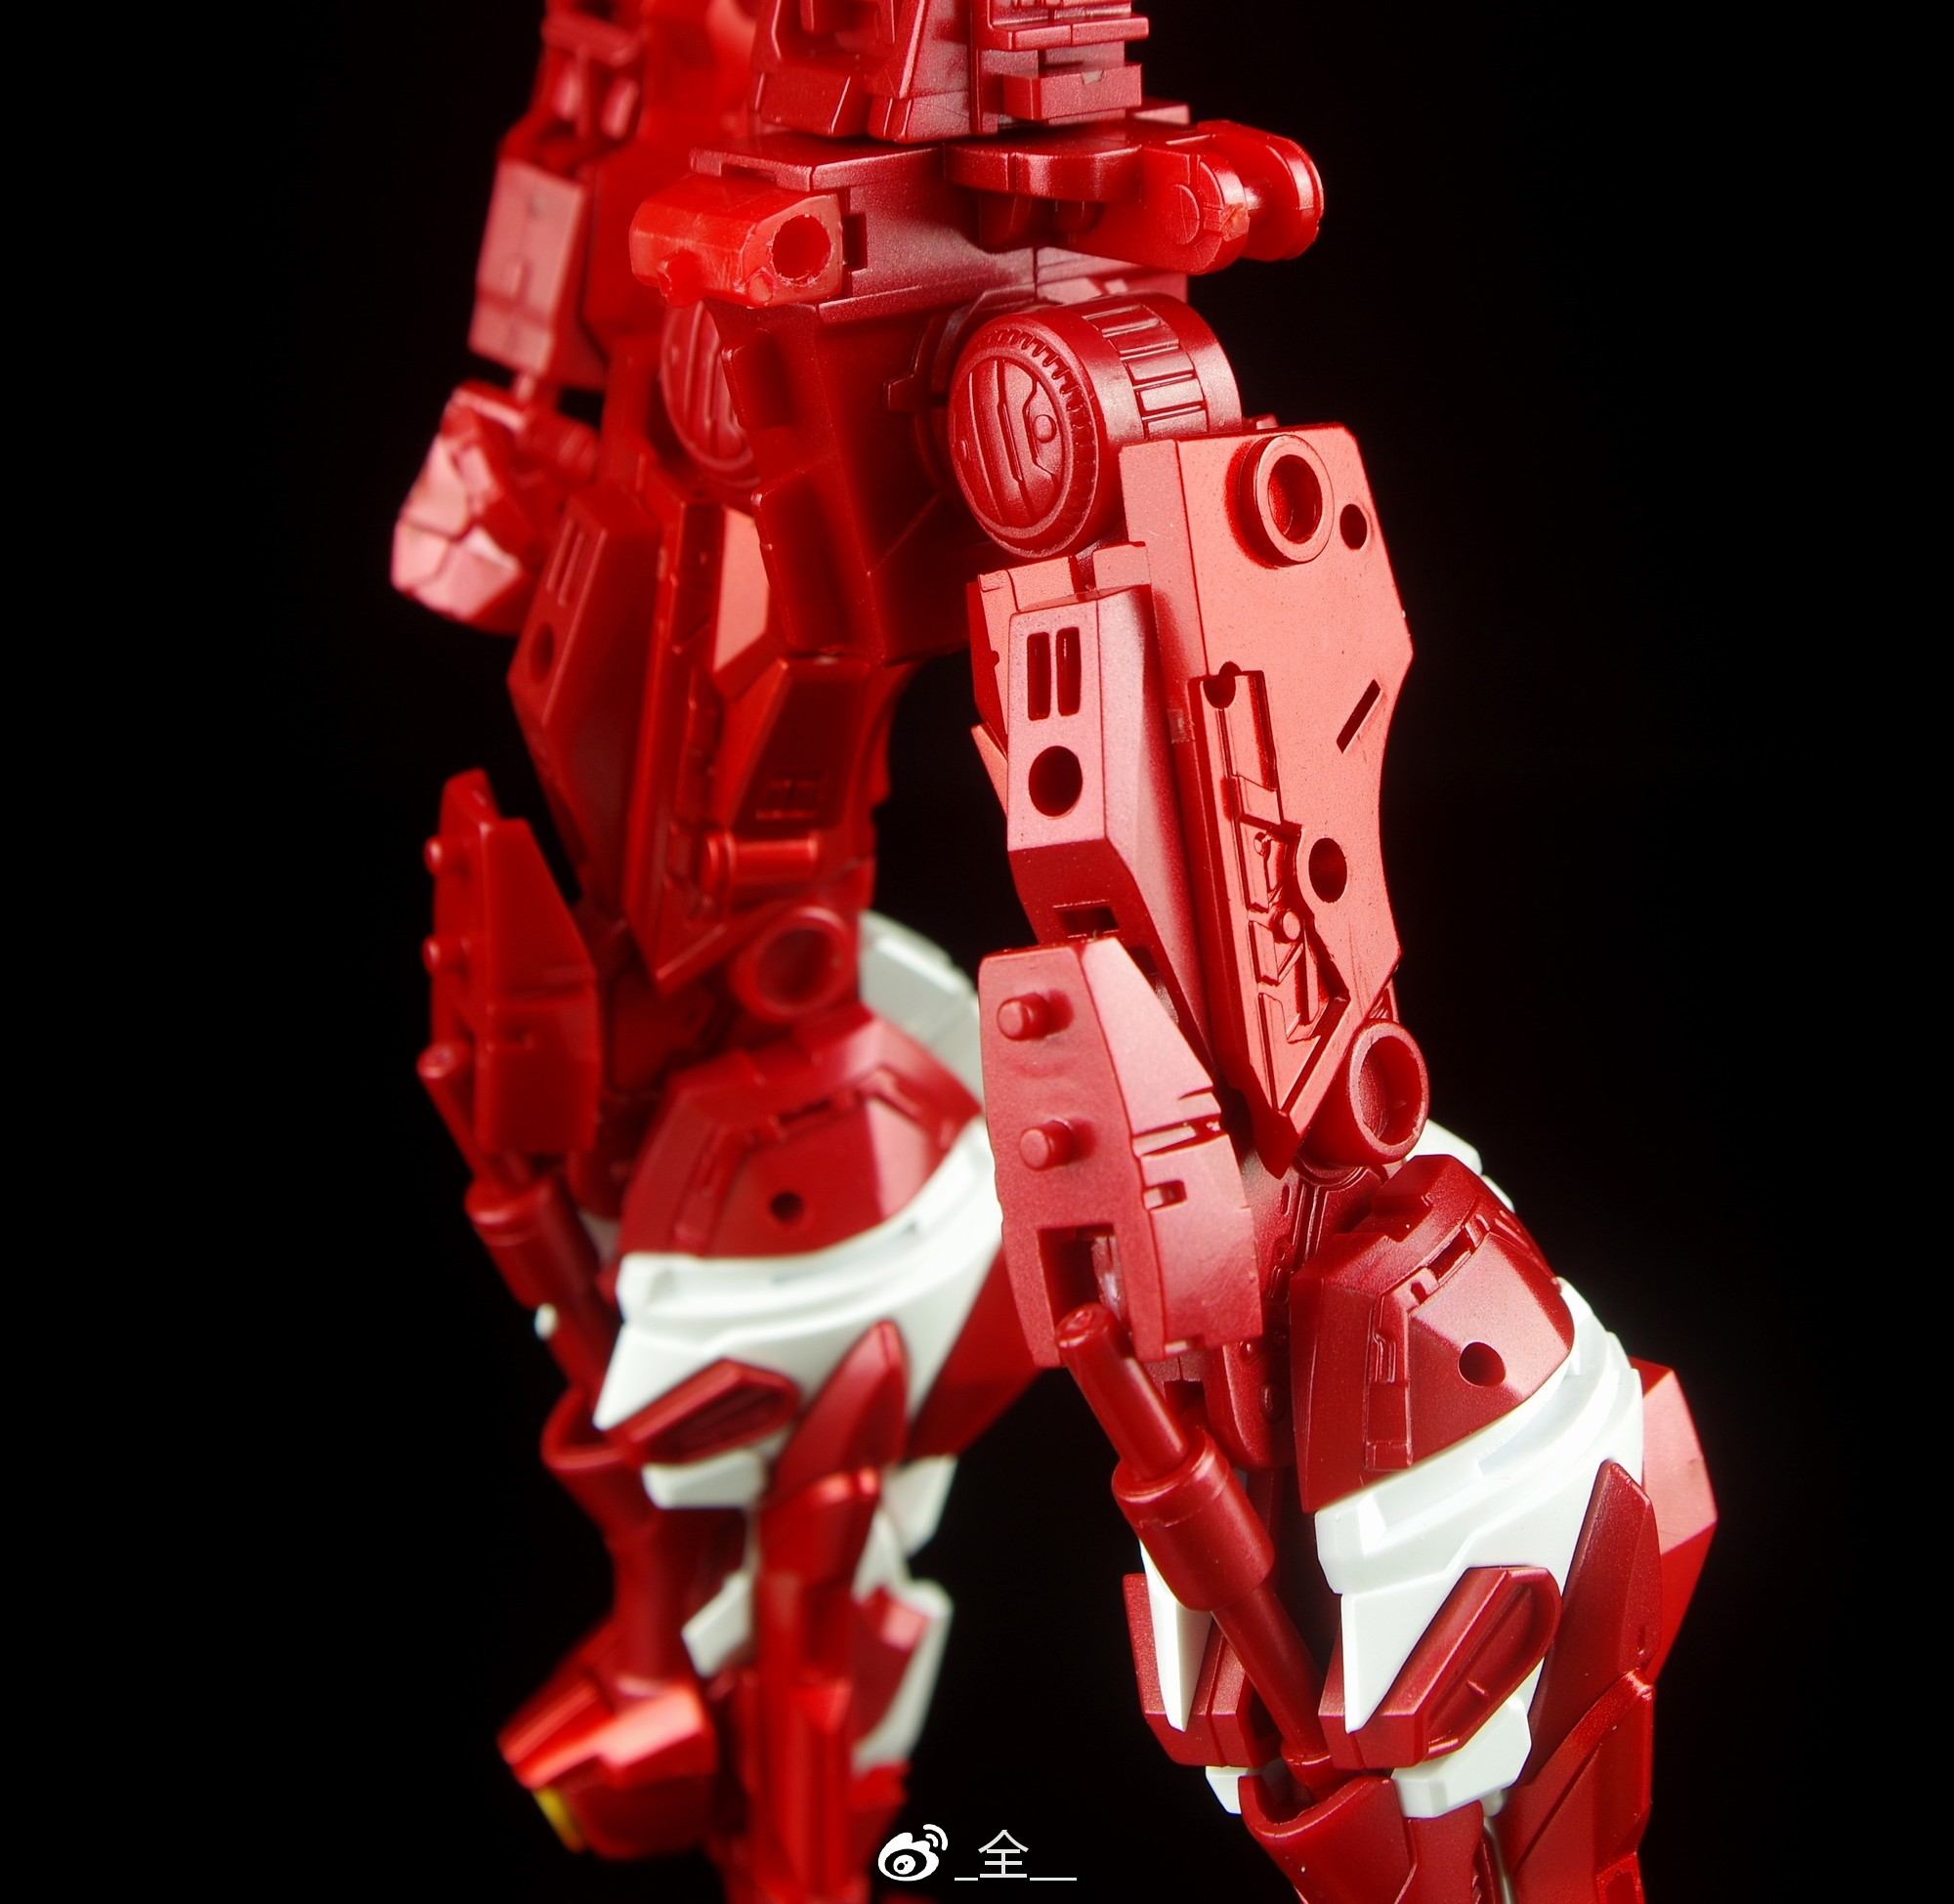 S246_3_MG_astray_red_kan_inask_014.jpg